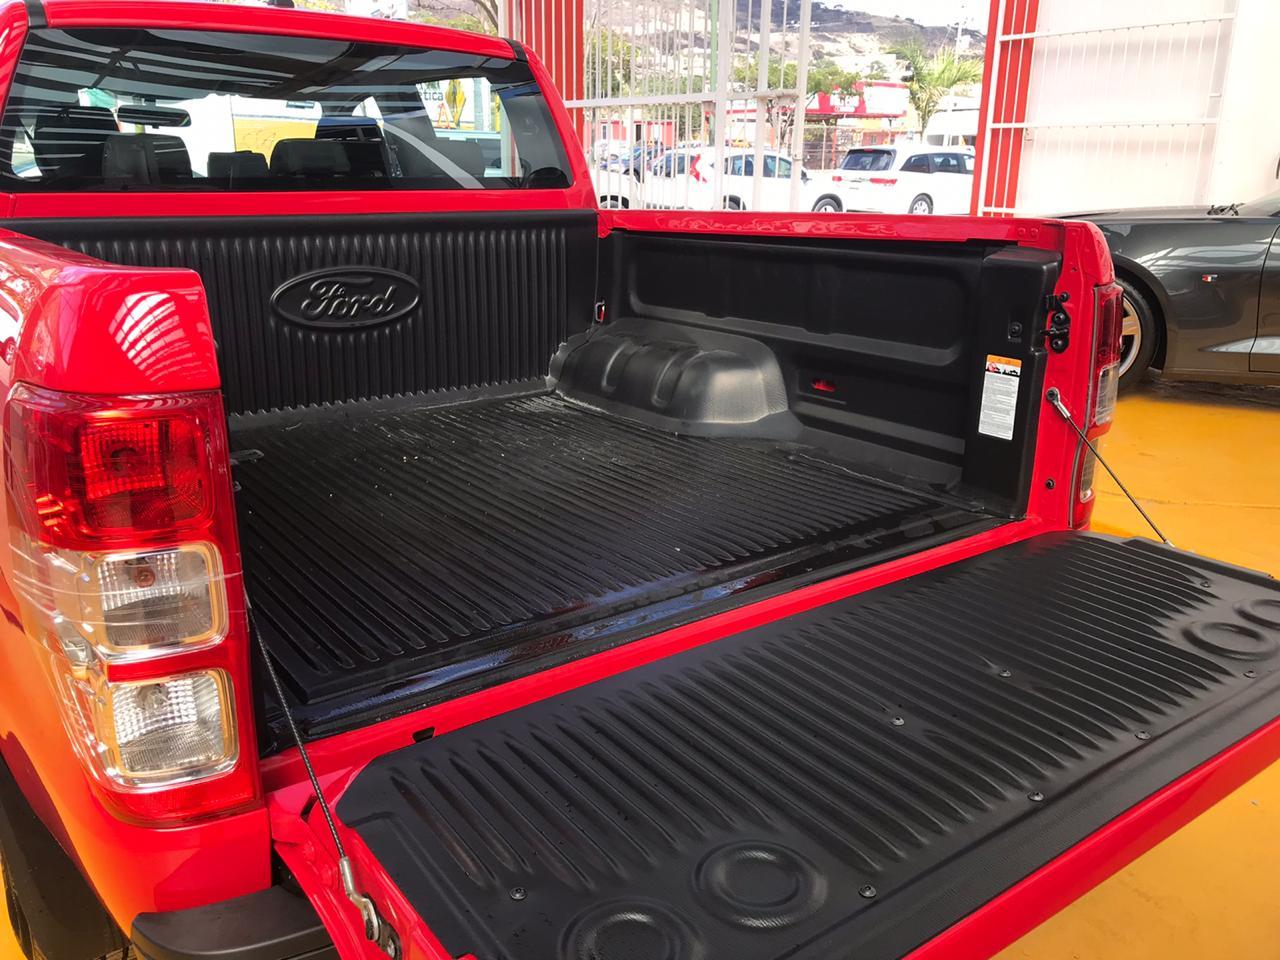 Ford Ranger, 2020 XL Gasolina 4×2 lleno